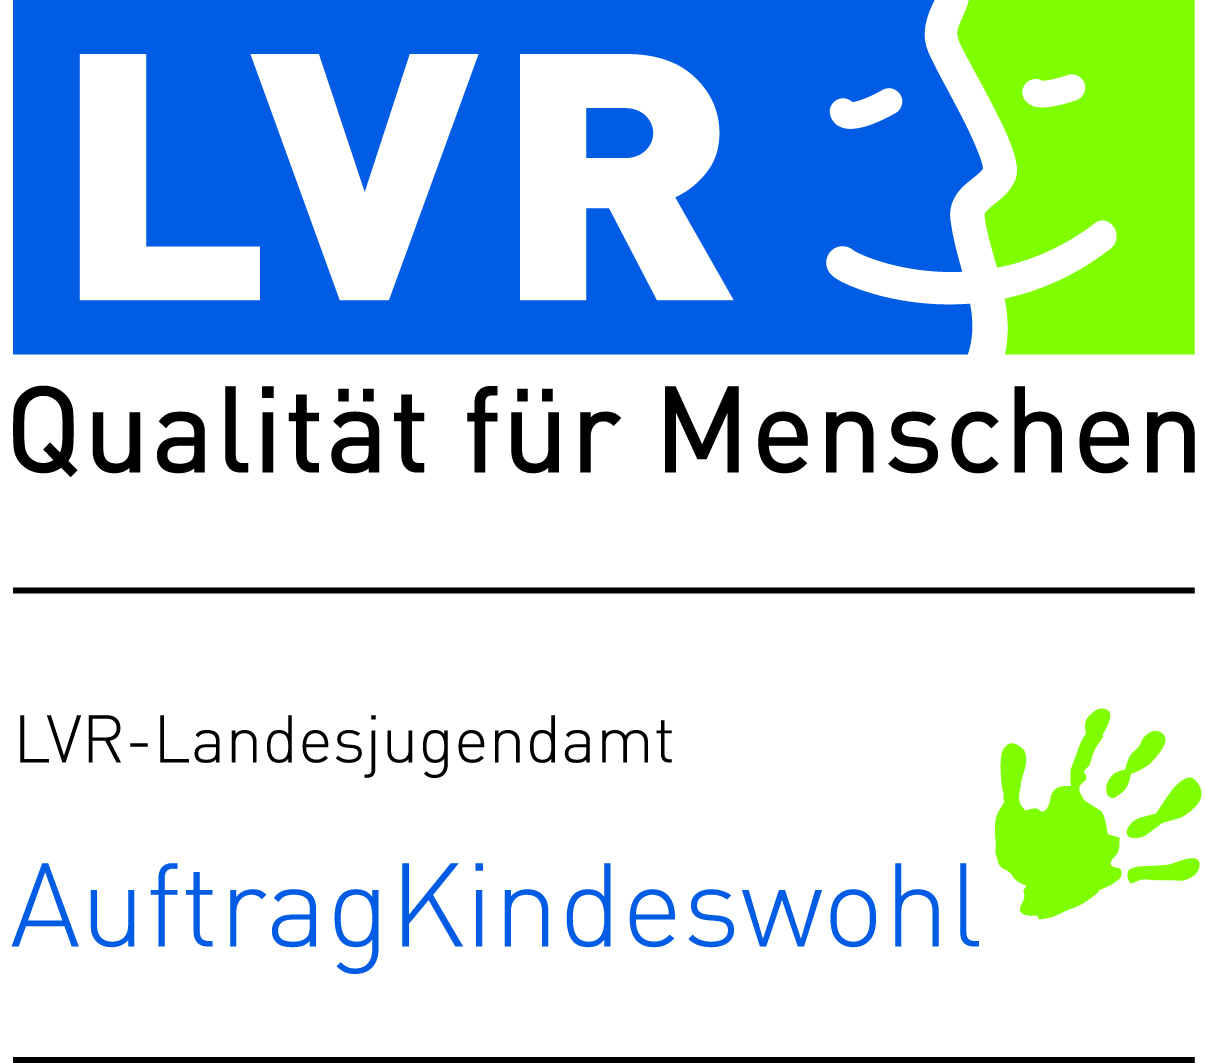 LVR_LJA_RZ_Basisformat.indd